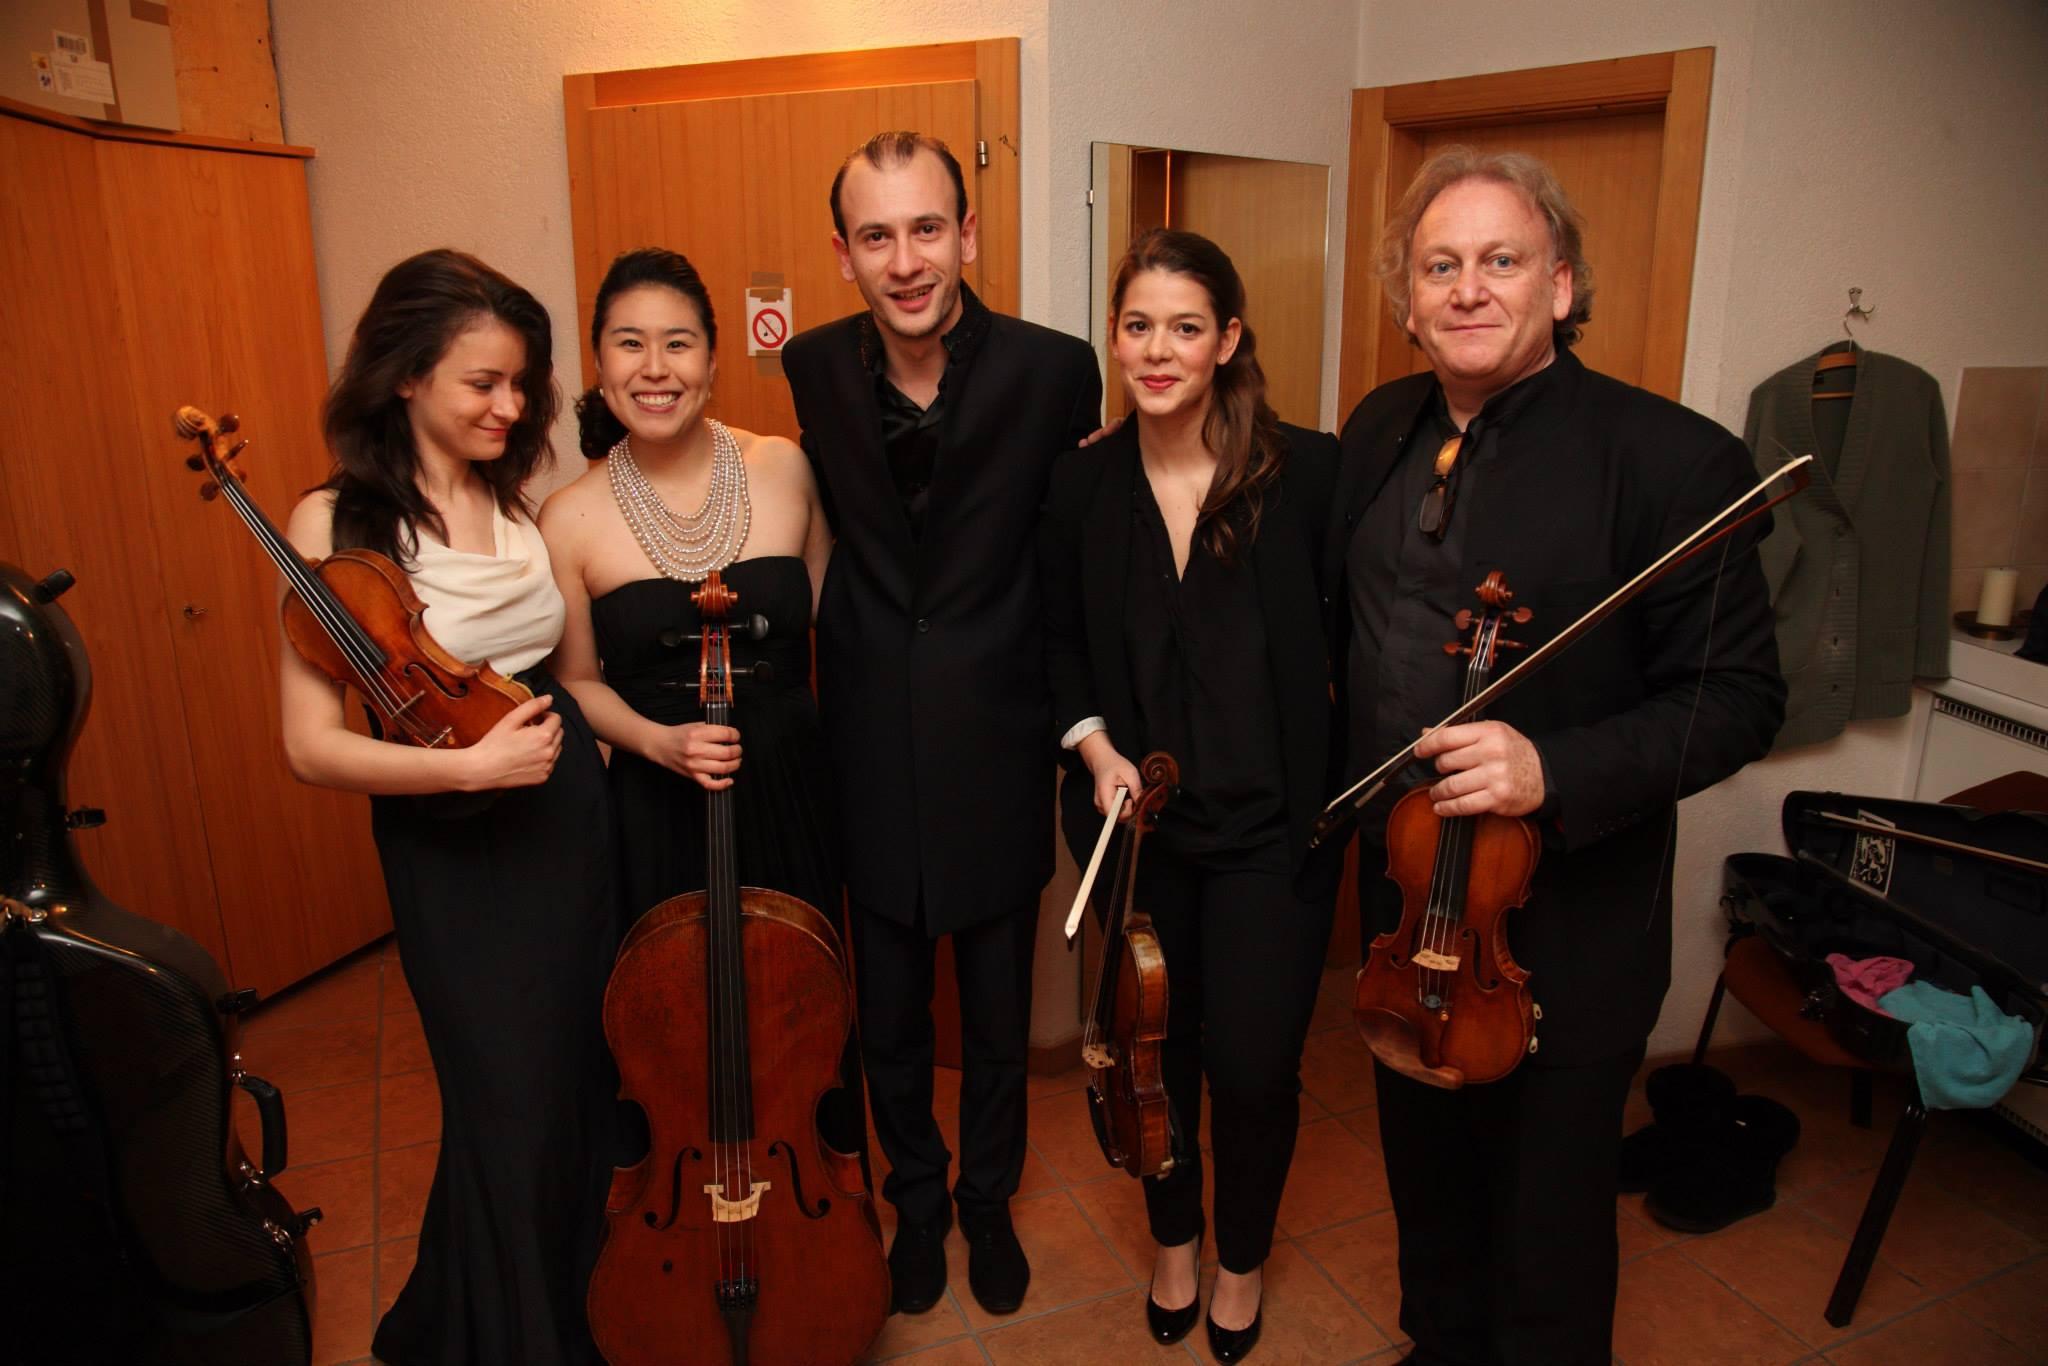 Crans-Montana Classics (2015): Liya Petrova, Deborah Pae, Ashot Khachatourian, Marie Chilemme, Michael Guttman